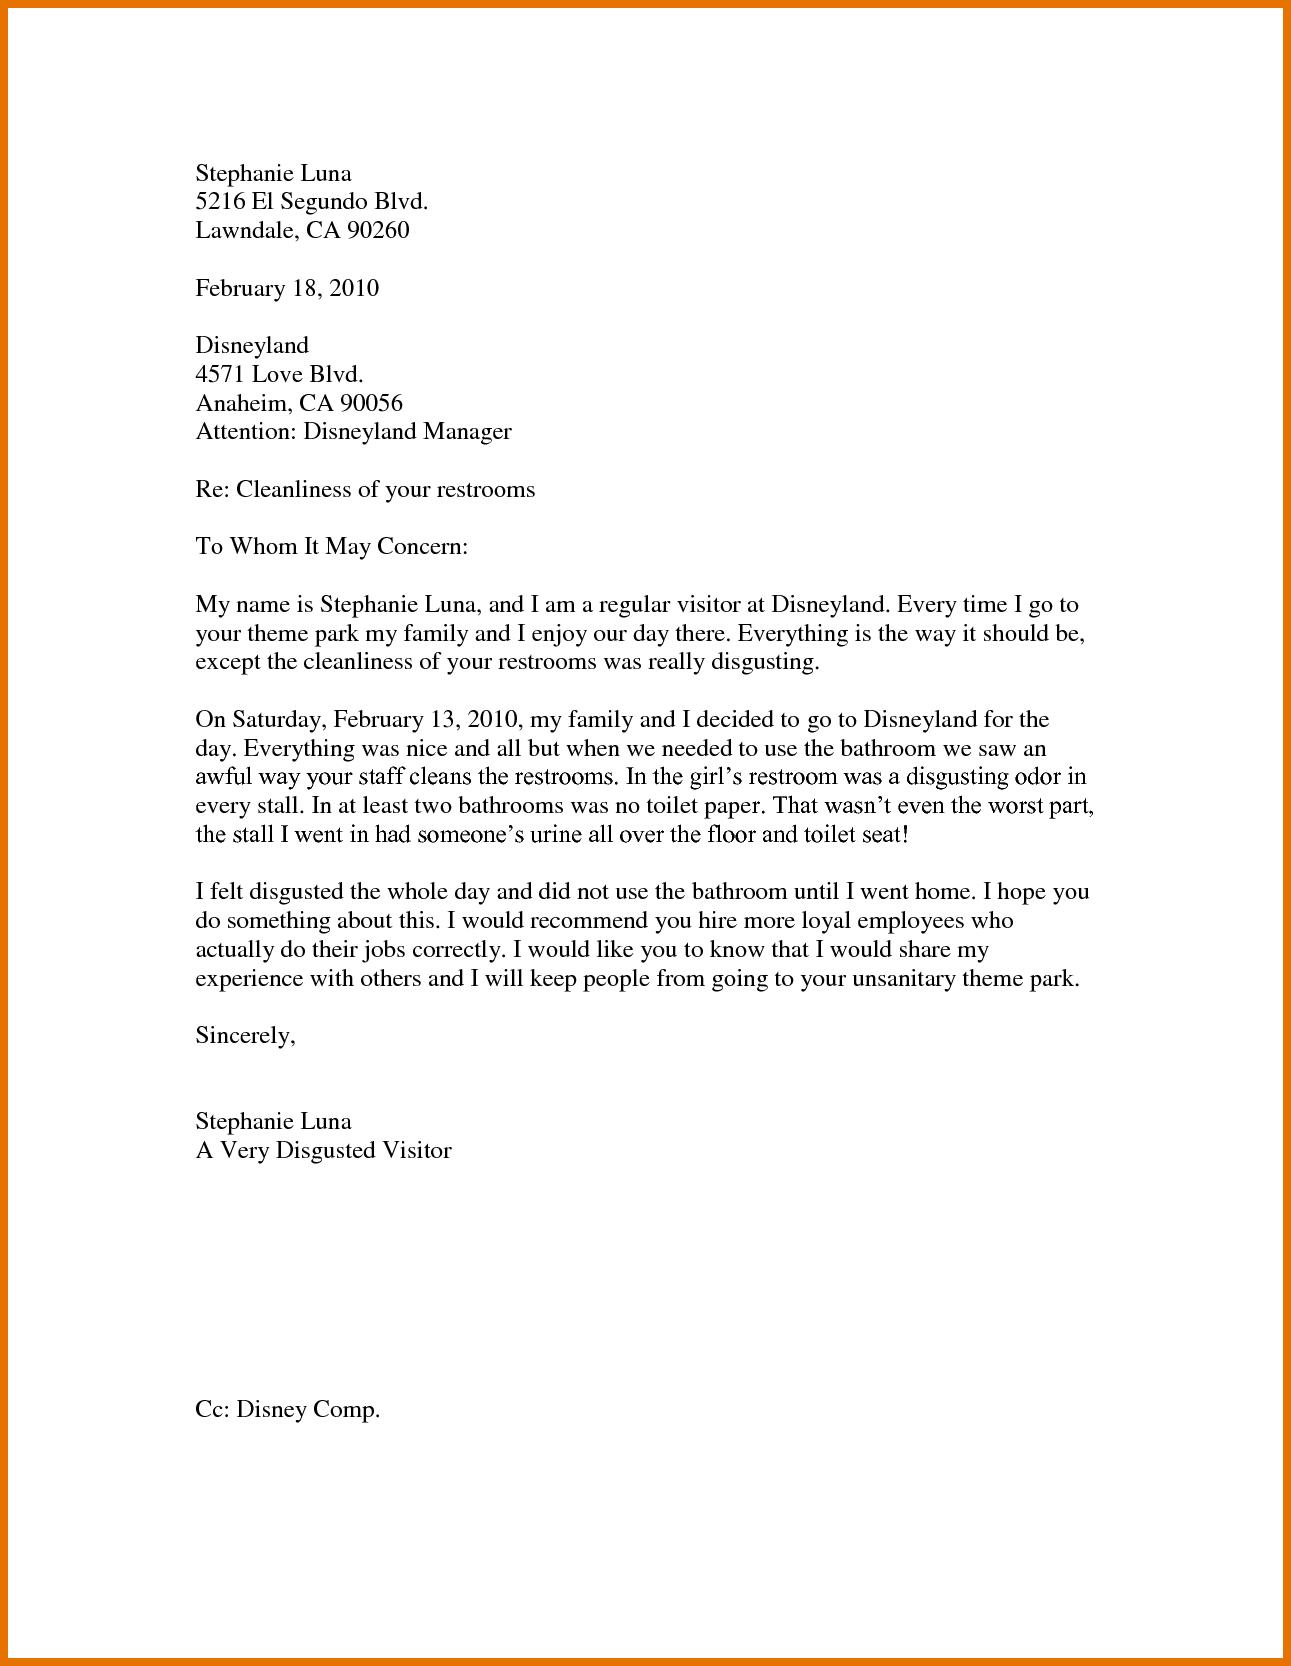 Business letter format for students sample international home business letter format for students sample international spiritdancerdesigns Images